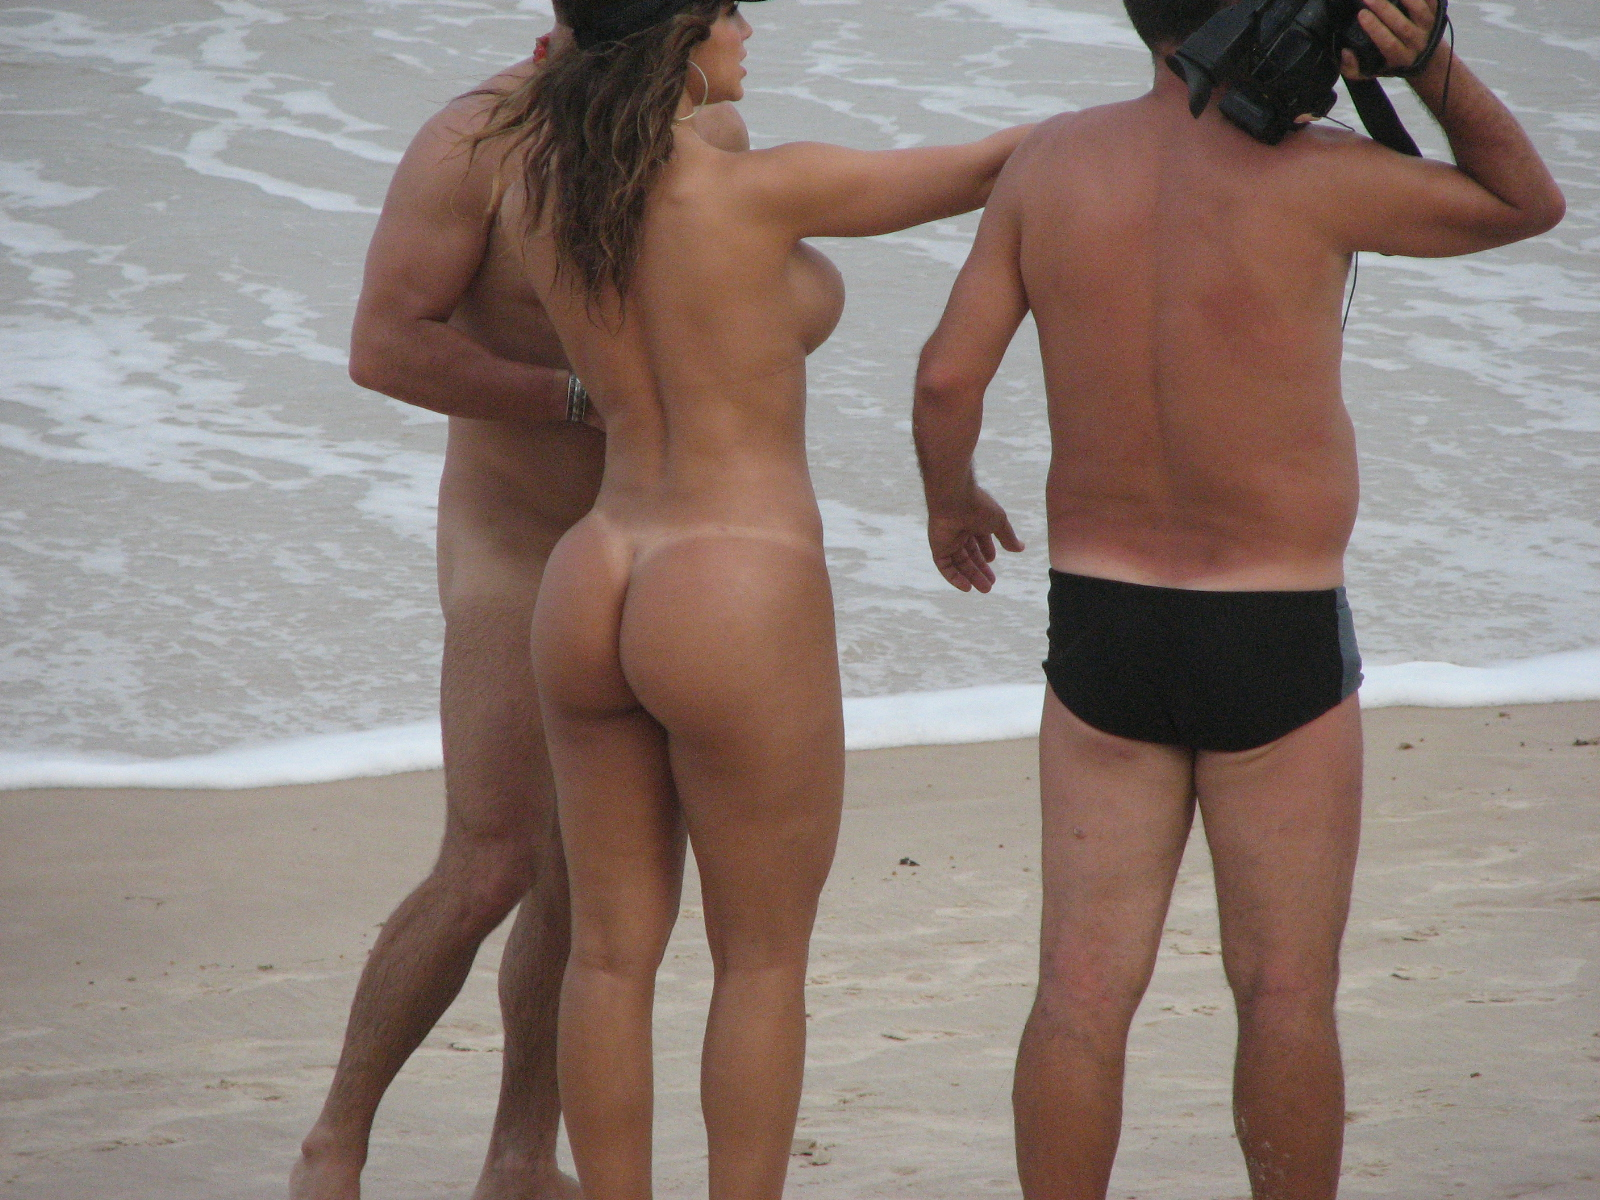 site de encontros totalmente gratis video sexo praia